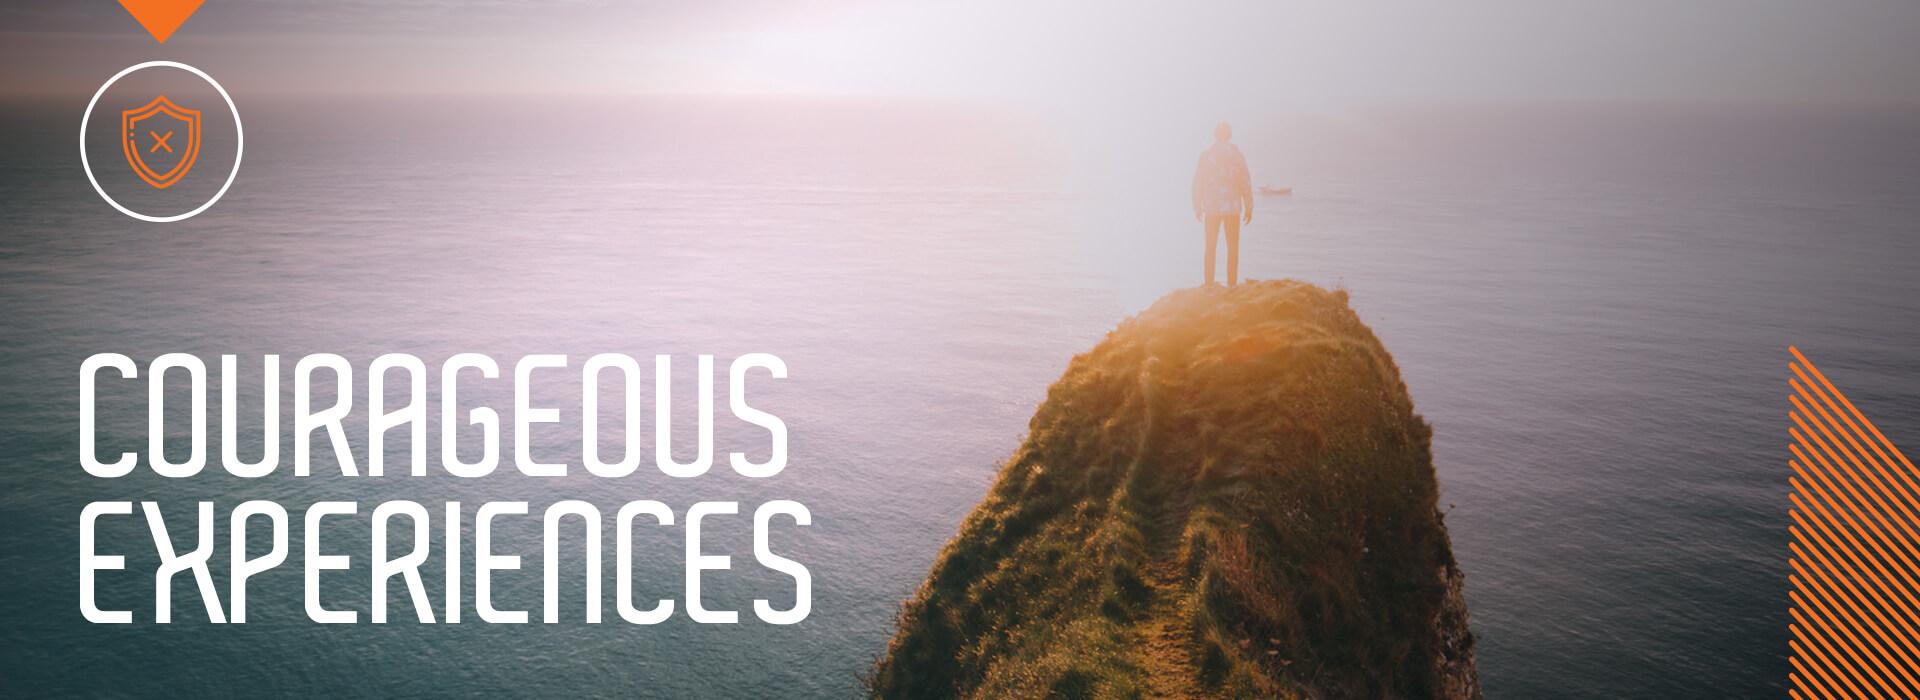 Courageous Experiences